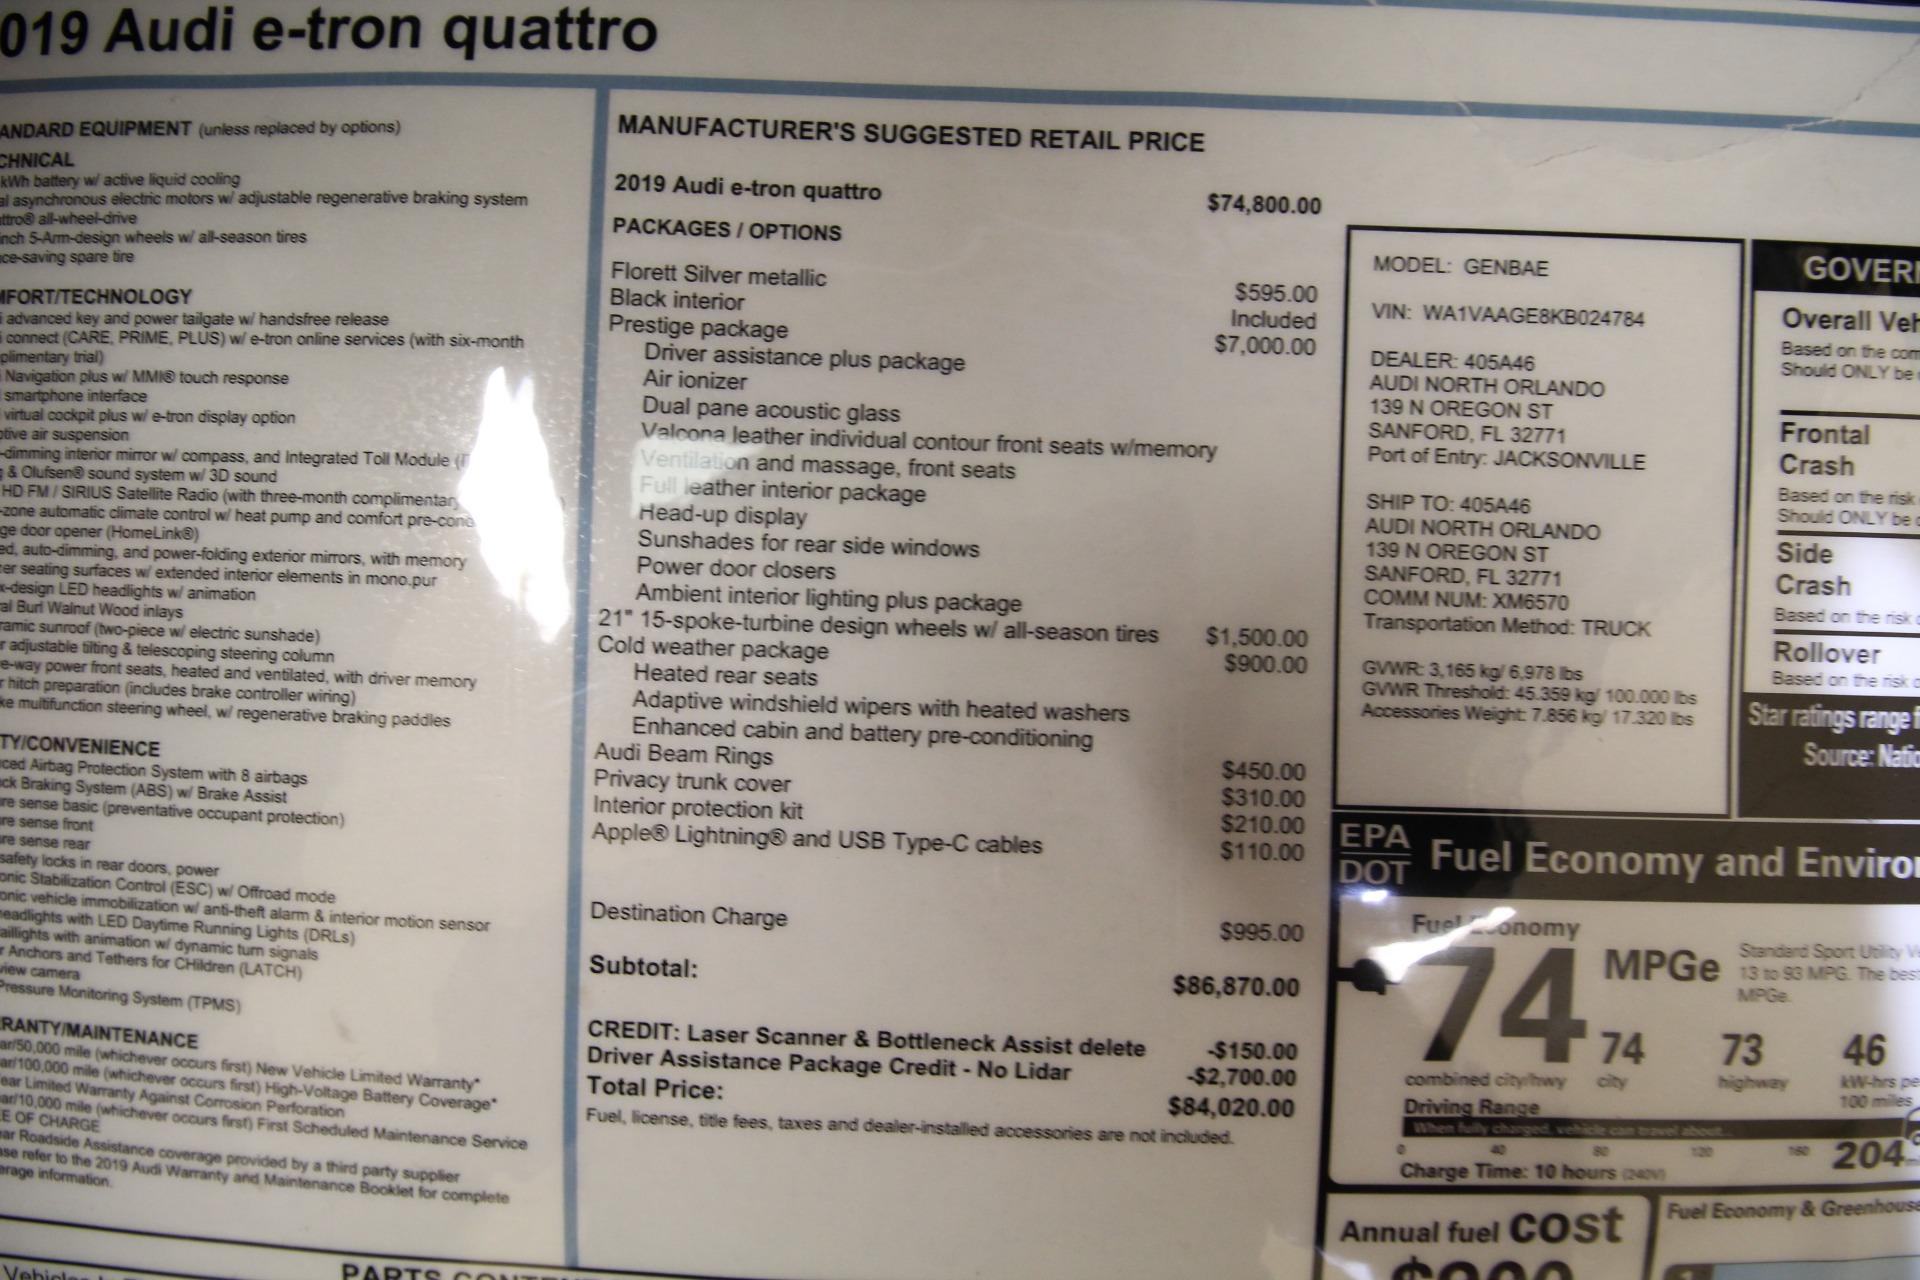 Used 2019 Audi e-tron Prestige quattro LIKE NEW 1 OWNER NEW KARMA TRADE 87K MSRP | Albany, NY